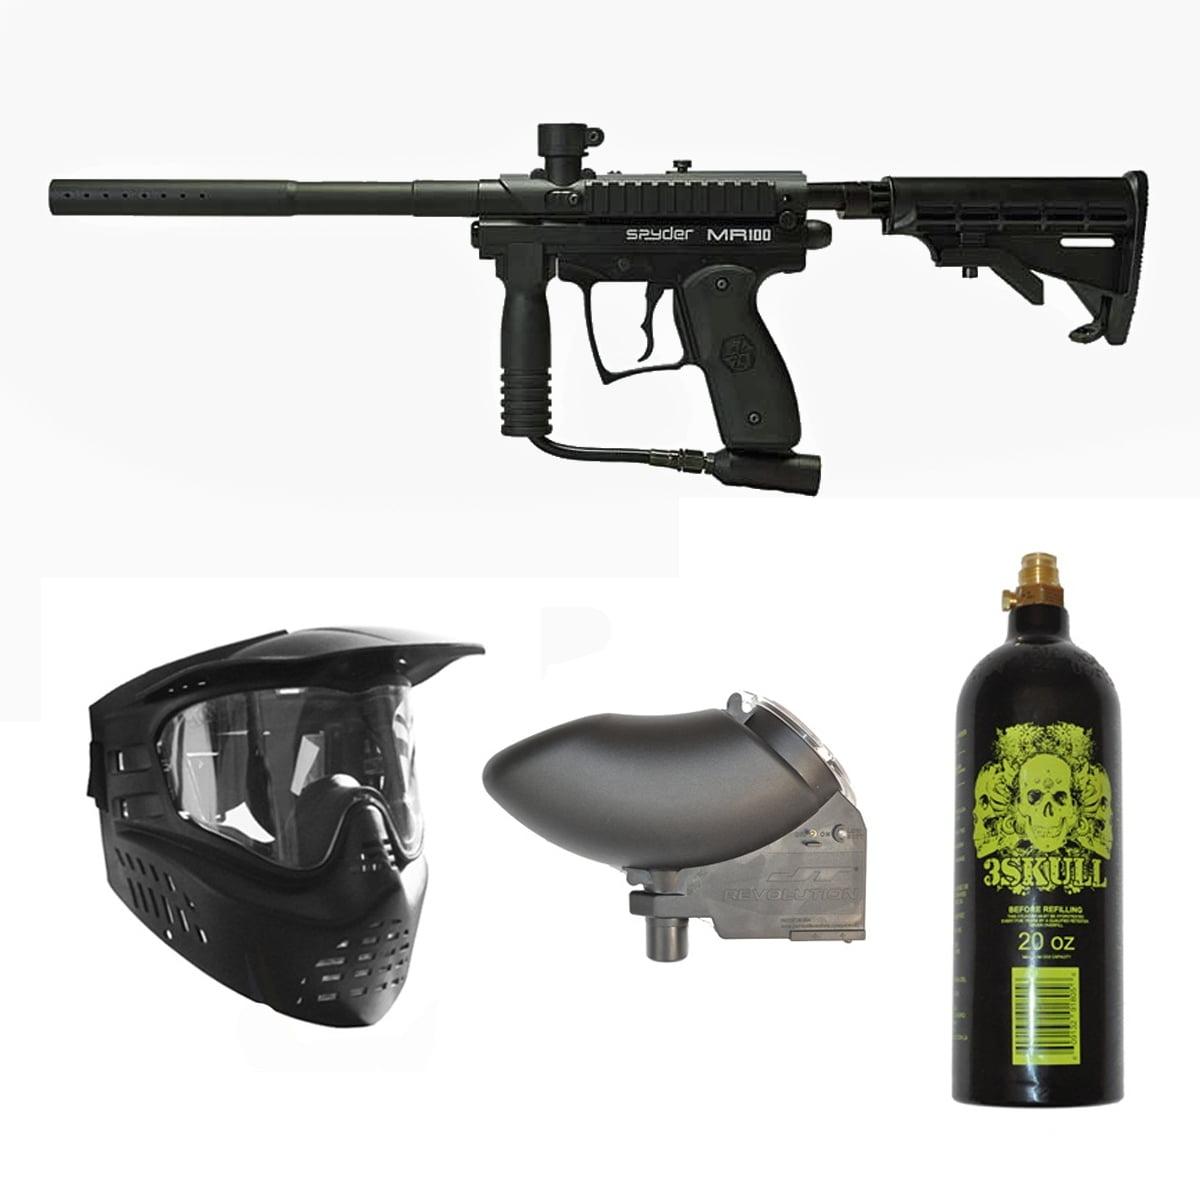 Spyder MR100 Pro Paintball Marker Gun + 20oz + GXG Mask + Revolution Hopper by